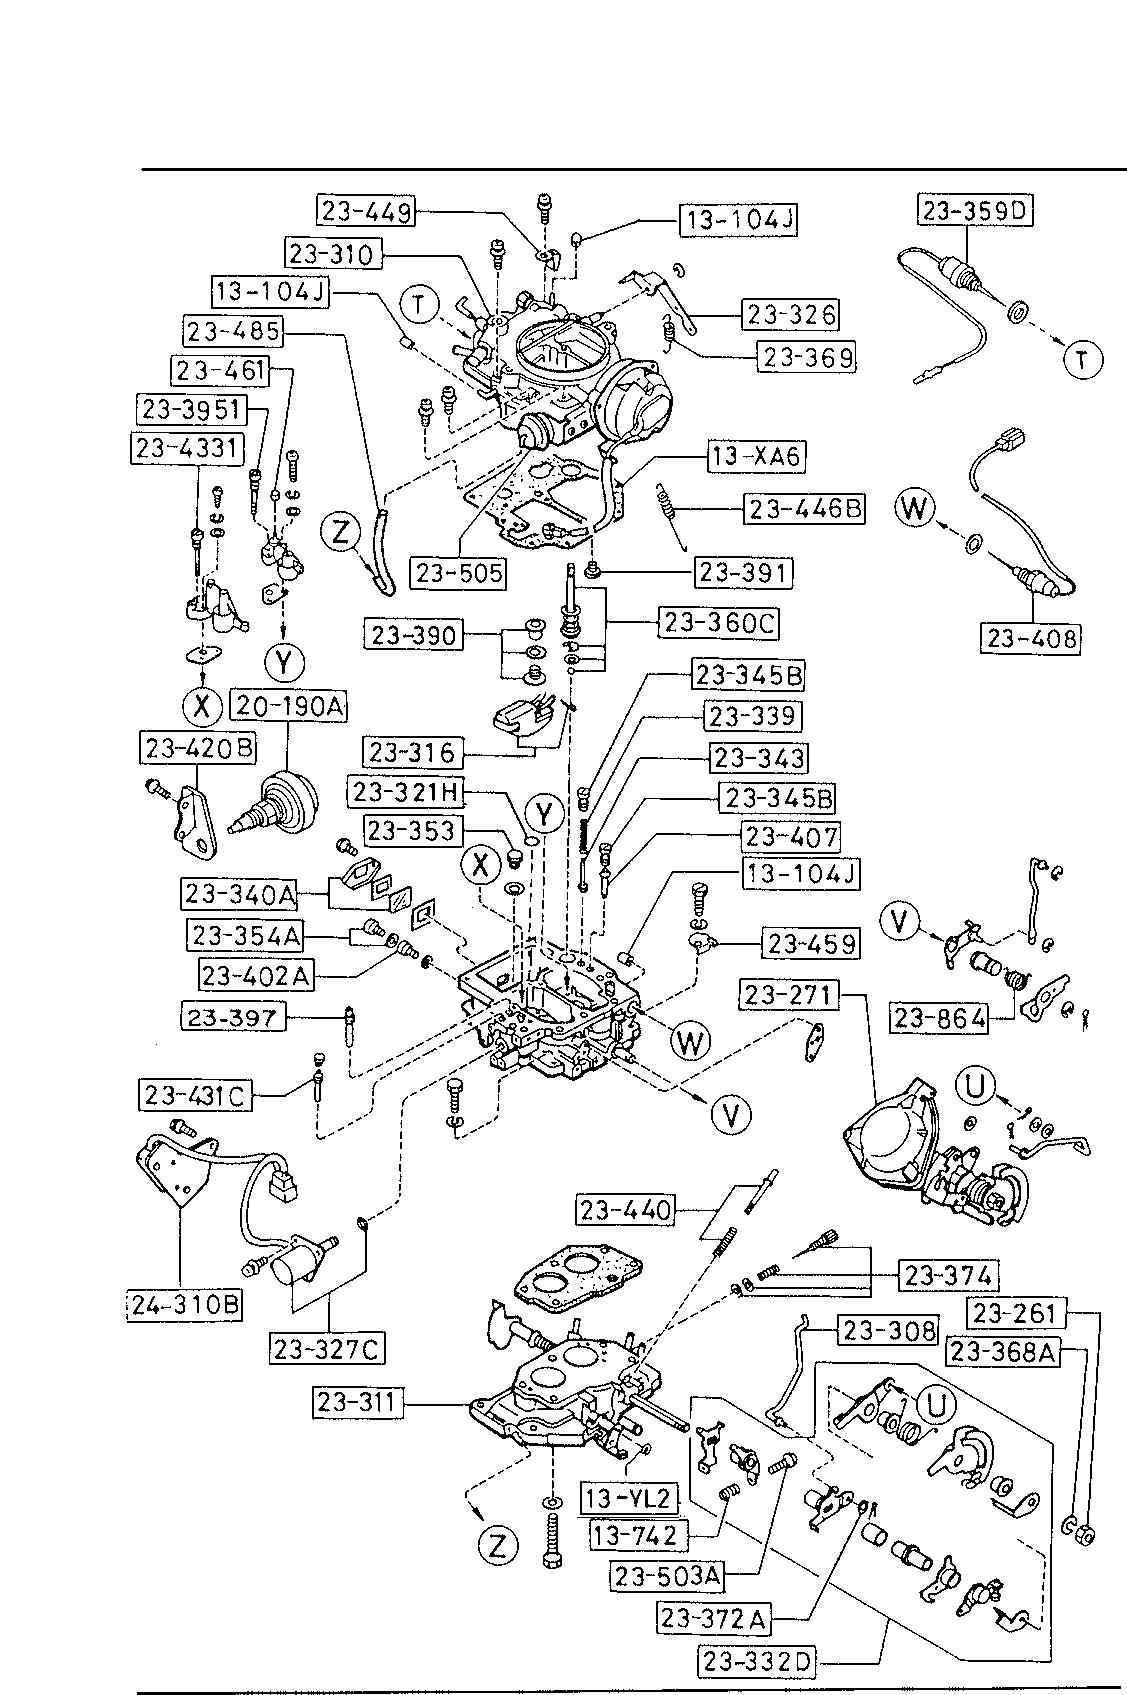 USA, 1987 B2600, GASOLINE-ENGINE SUPPLEMENT, 1360 - CARBURETOR COMPONENTS  (2000CC) - Catcar.infoCATCAR.INFO